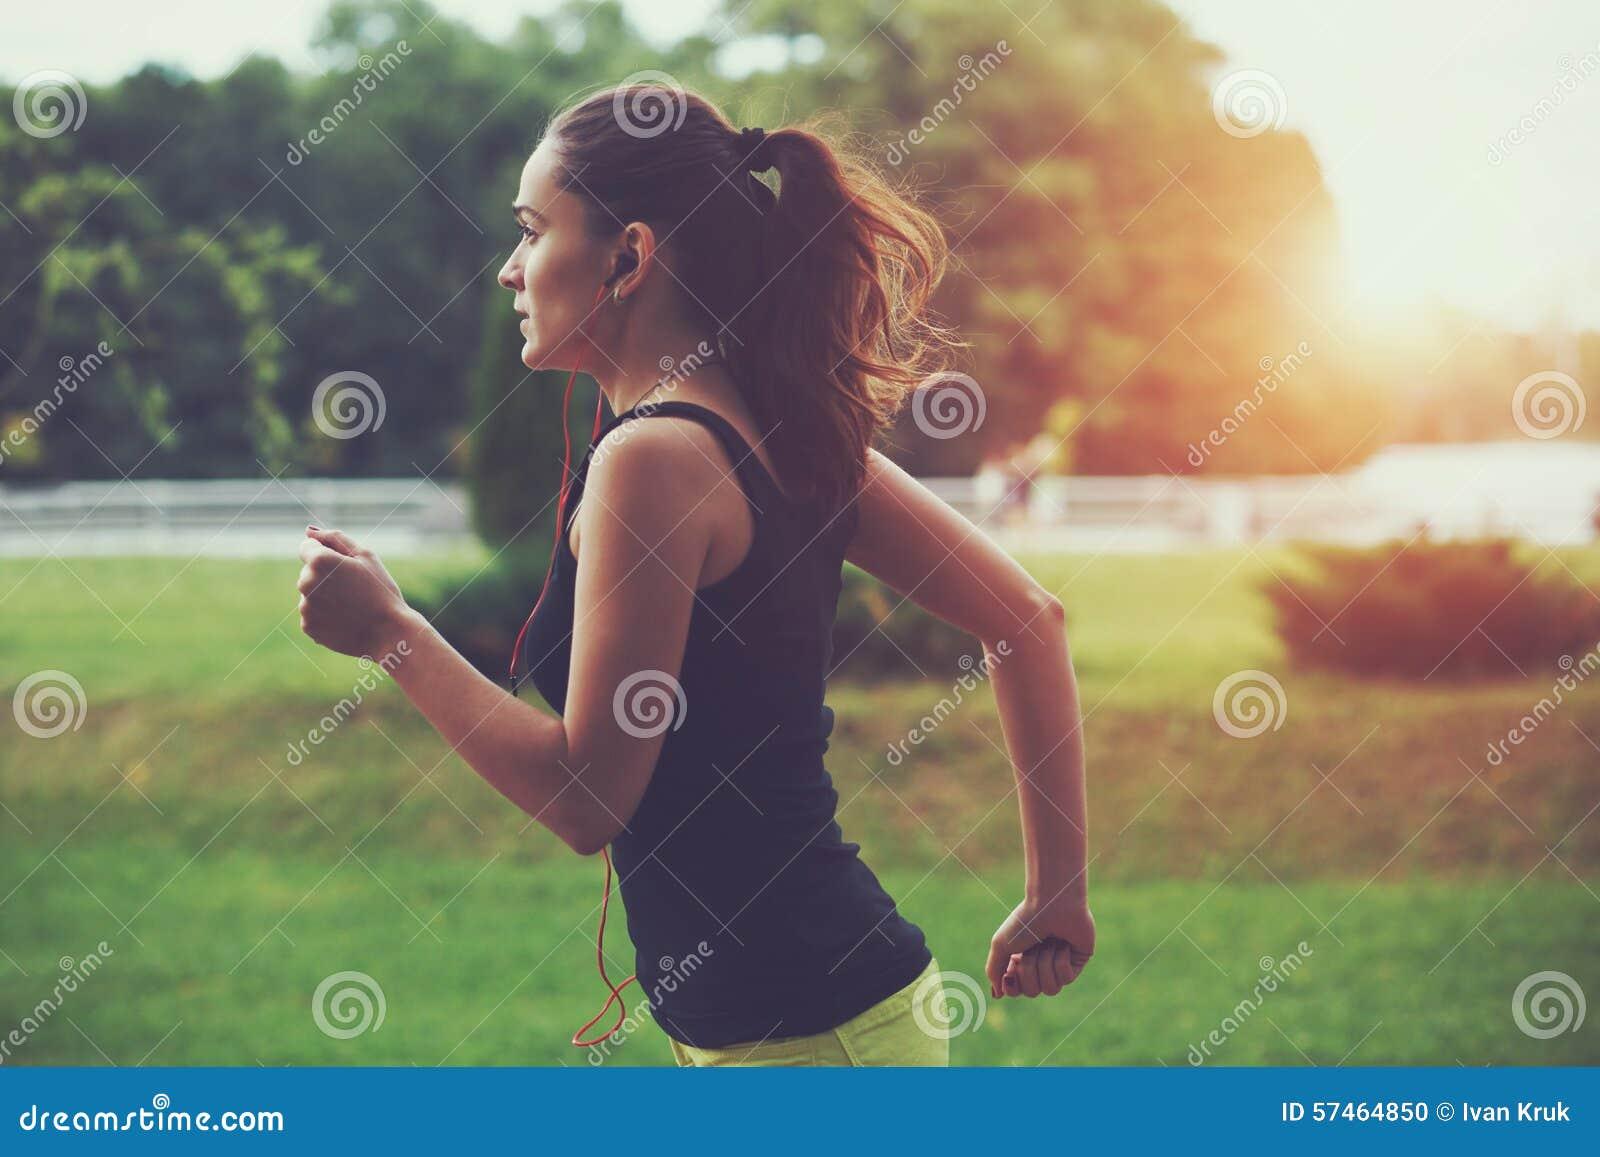 Woman jogging at park